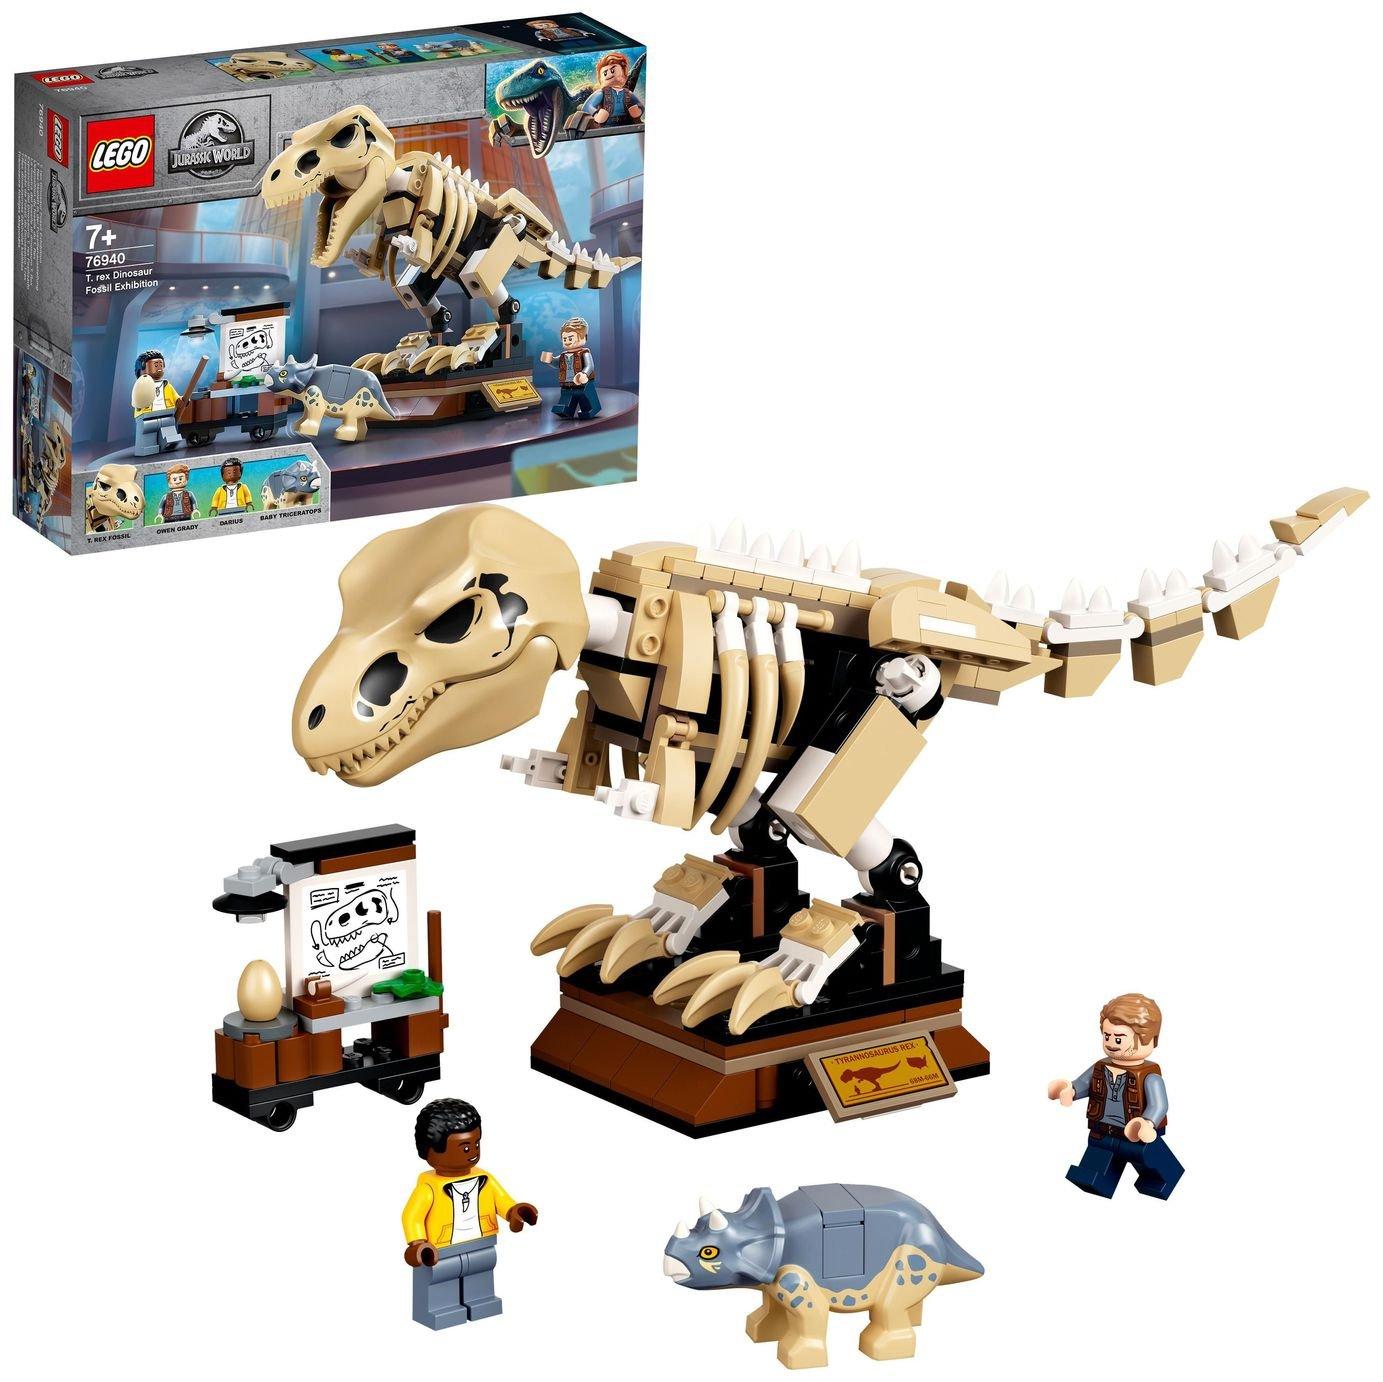 LEGO Jurassic World T. rex Dinosaur Fossil Toy Set 76940